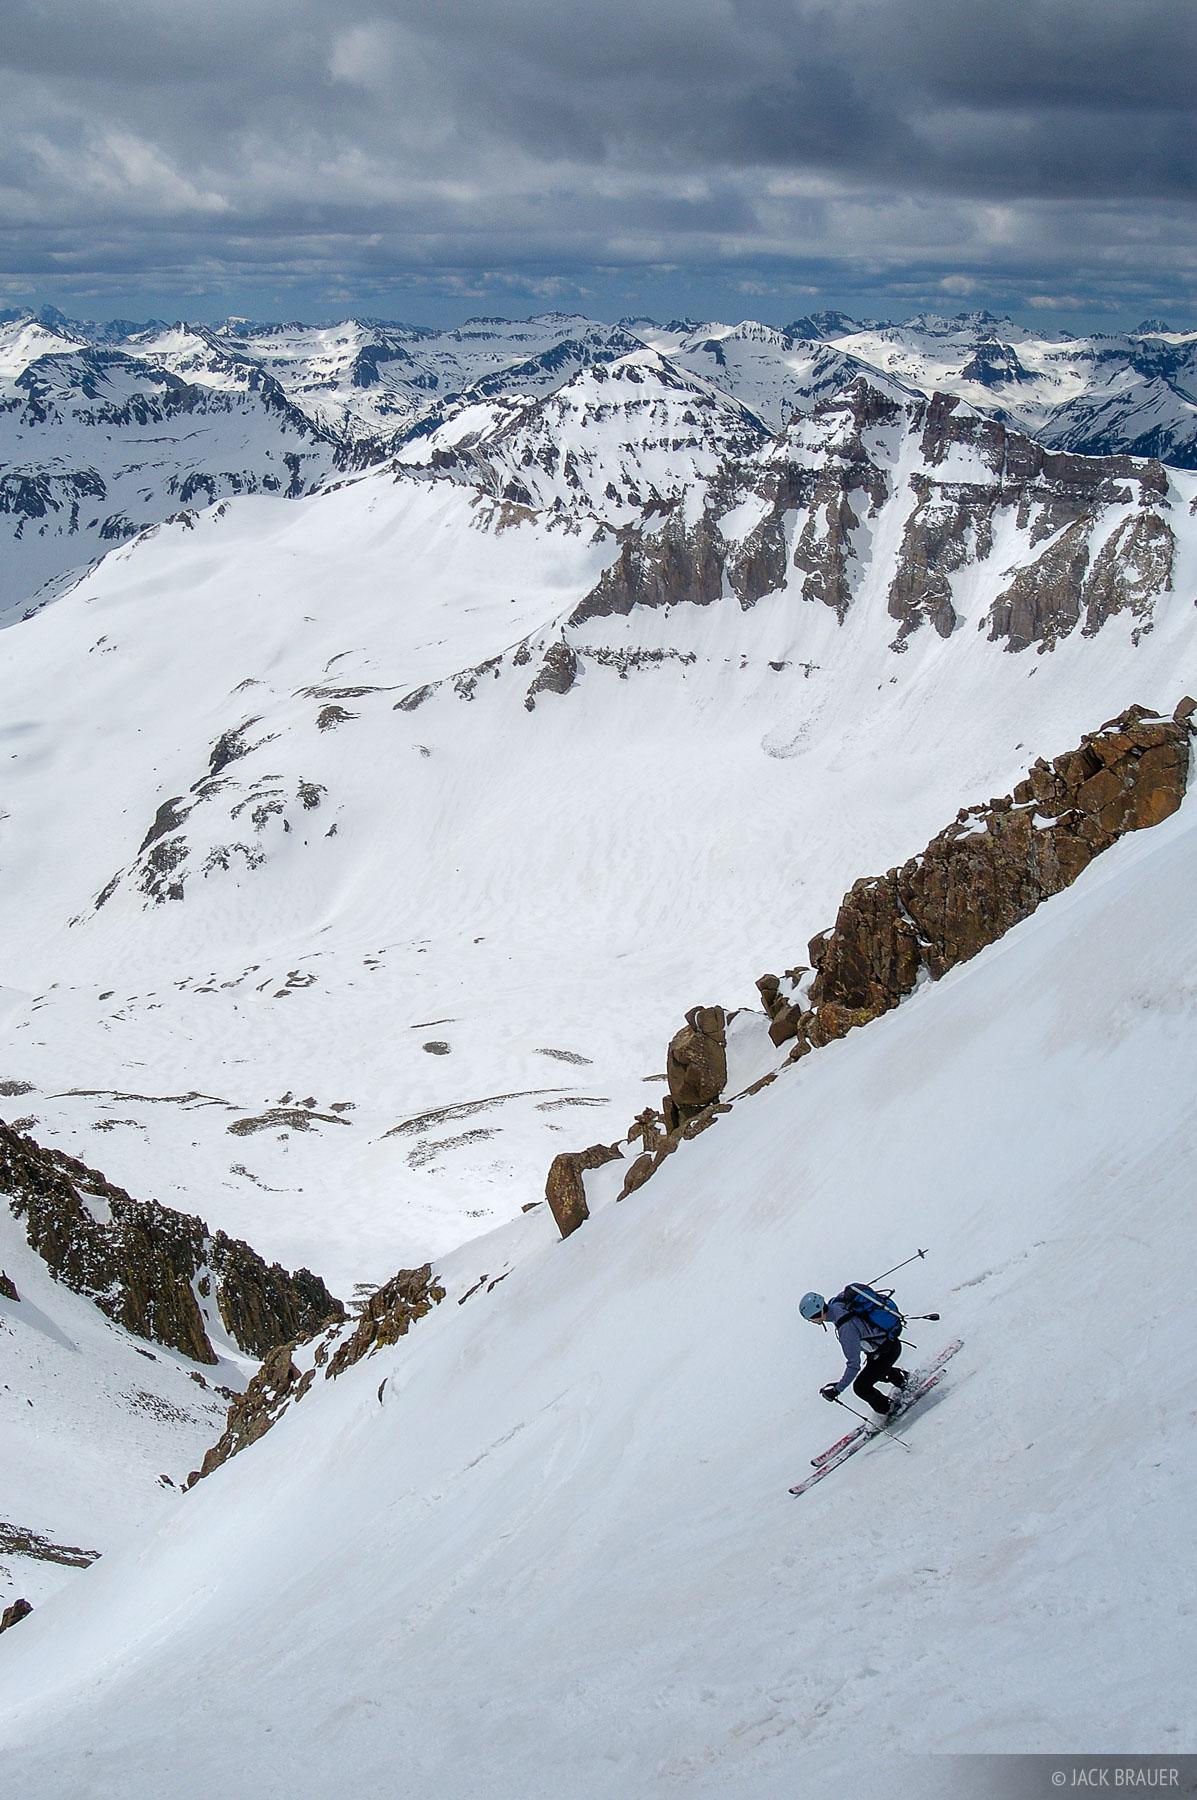 skiing, Mt. Sneffels, Lavendar Col, San Juans, Colorado, 14er, June, spring, backcountry, photo